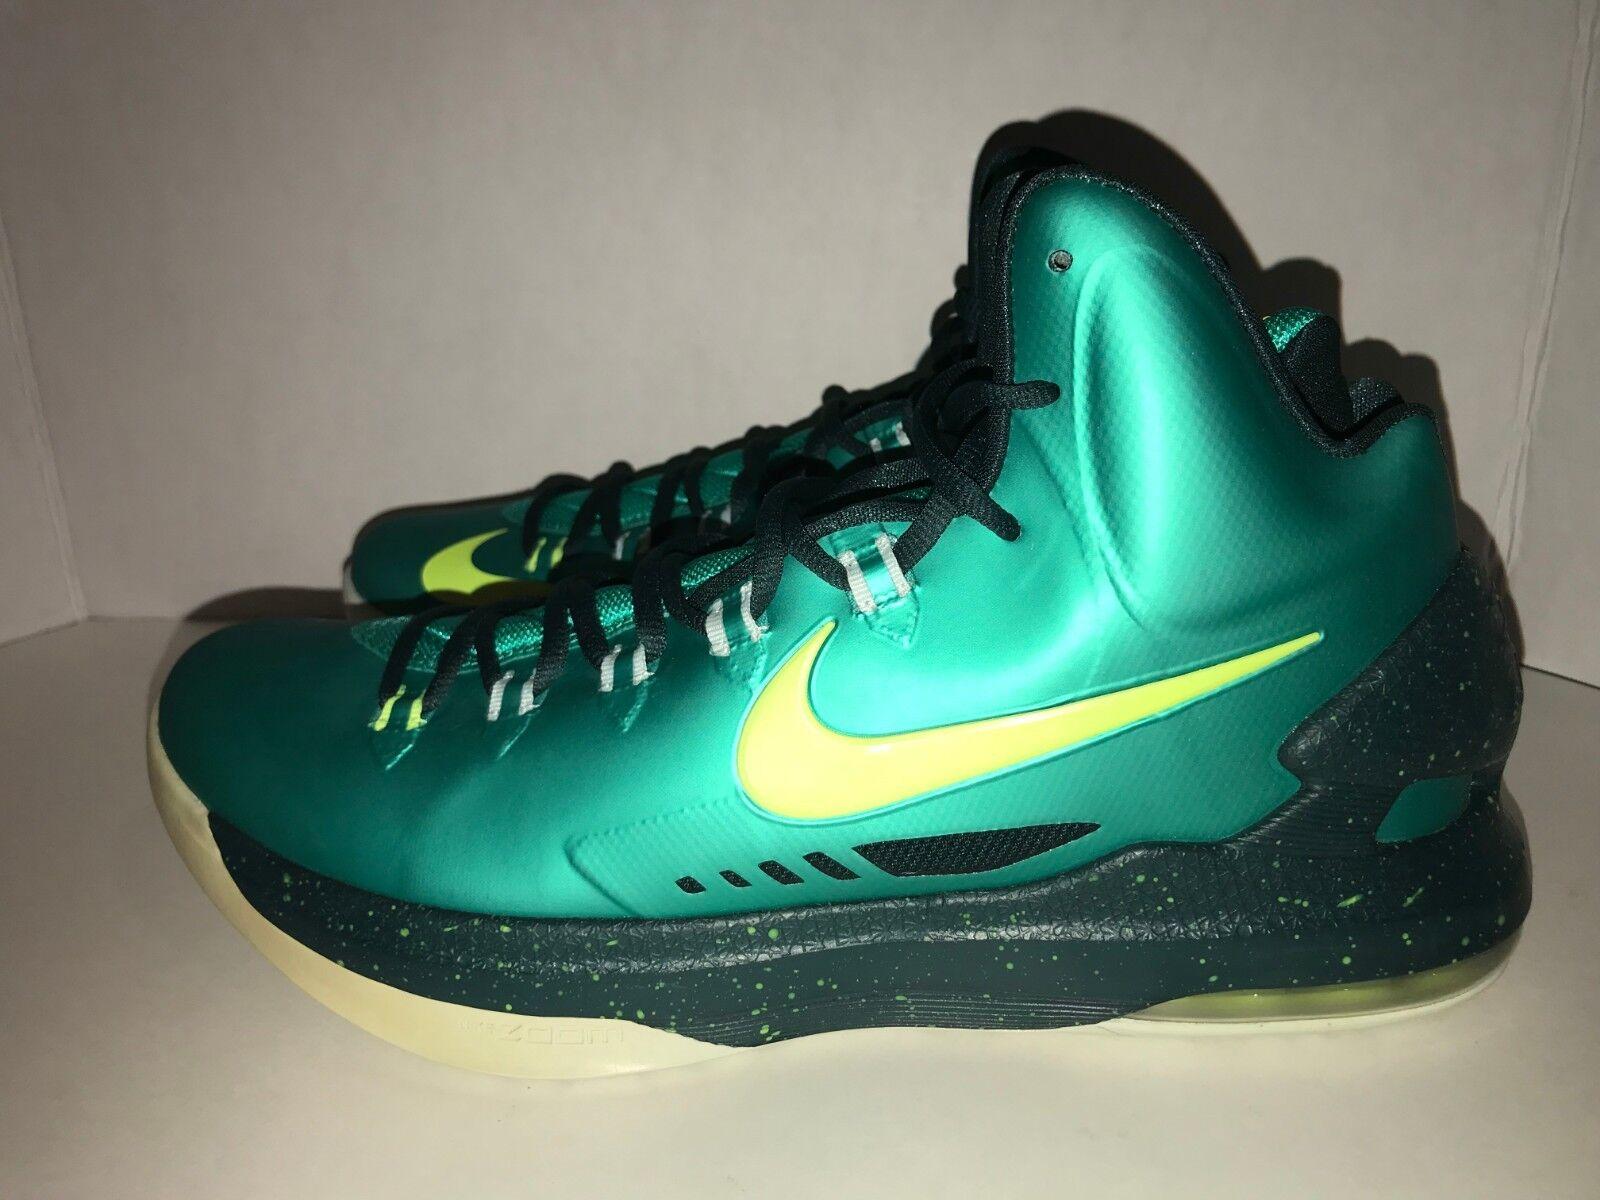 Nike Kevin Durant KD V Incredible Hulk Men's Size 11 DS 583111 300